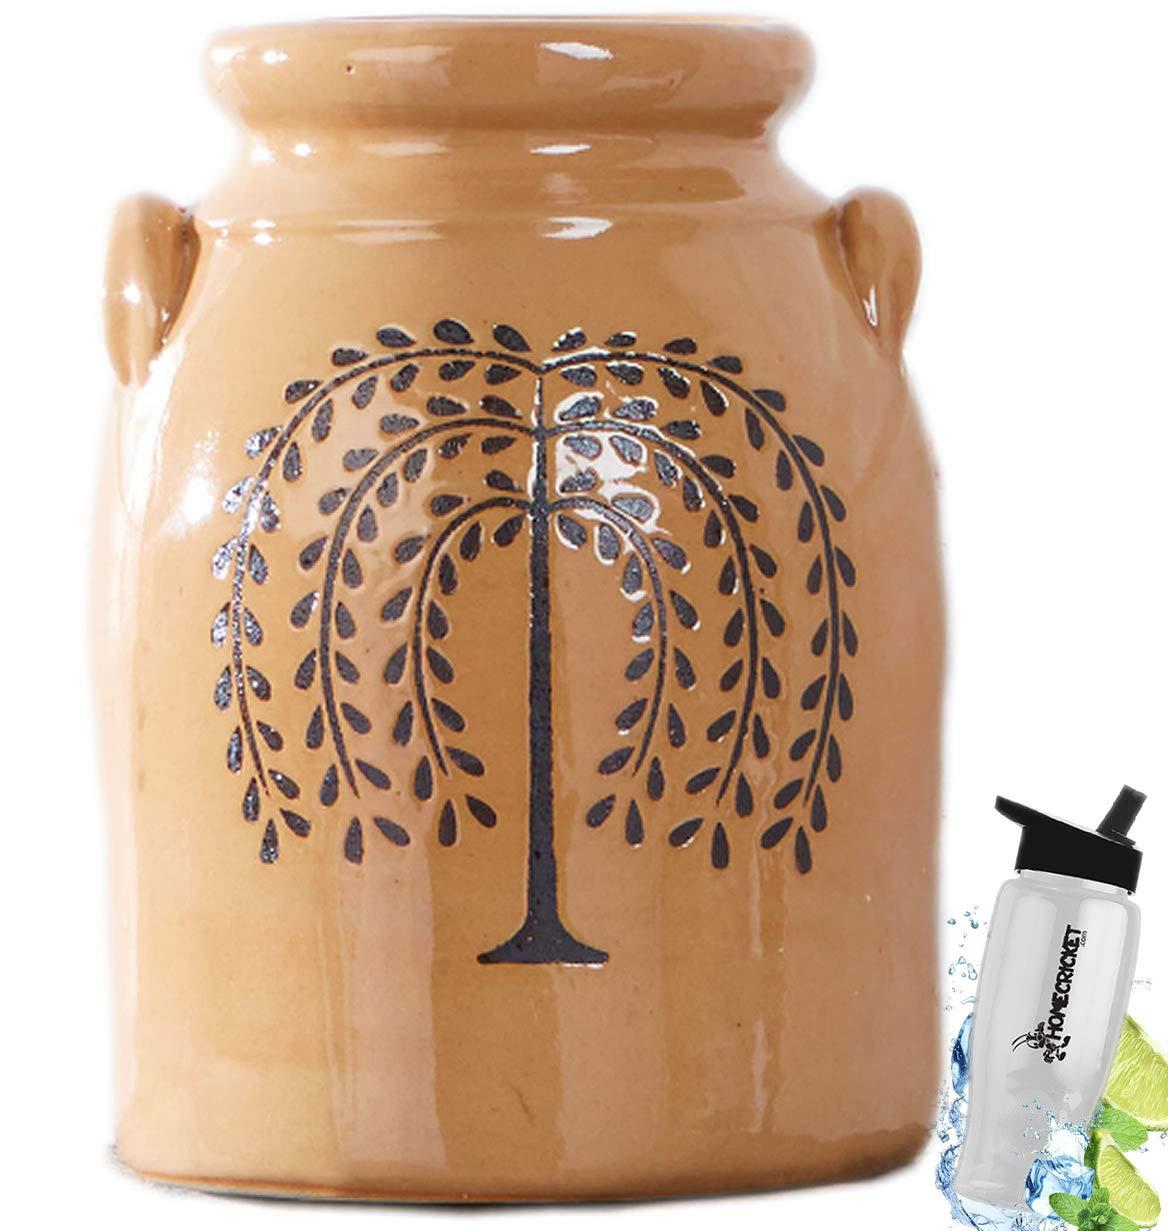 HomeCricket Gift Included- Decorative Farmhouse Country Kitchen Primitive Utensil Crock or Flower Vase Willow Tree+ Free Bonus Water Bottle